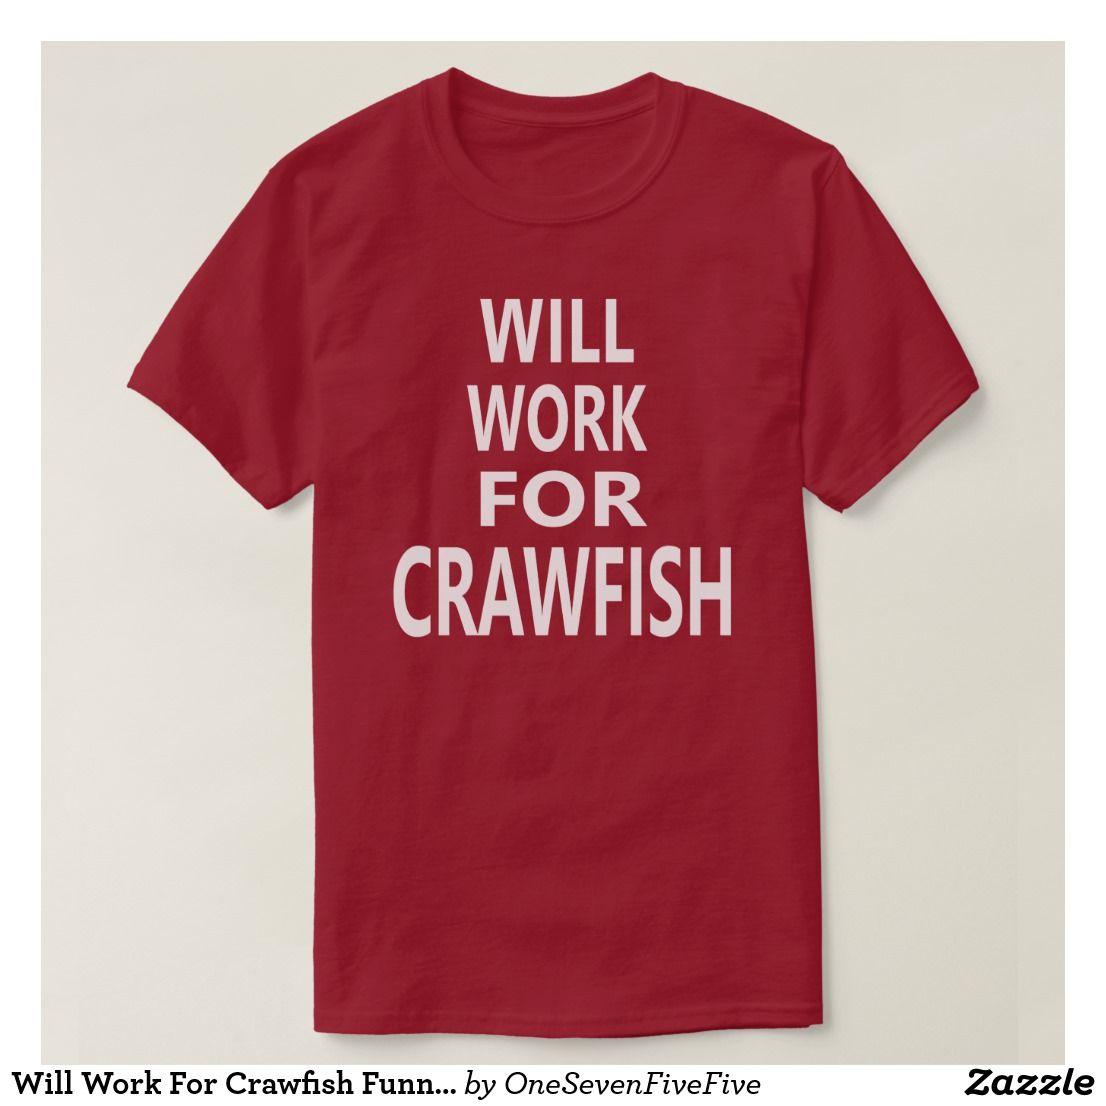 52671b04 Will Work For Crawfish Funny Louisiana Cajun T-shirt There is no better  Louisiana cuisine than crawfish...crawfish etouffee, boiled crawfish, ...